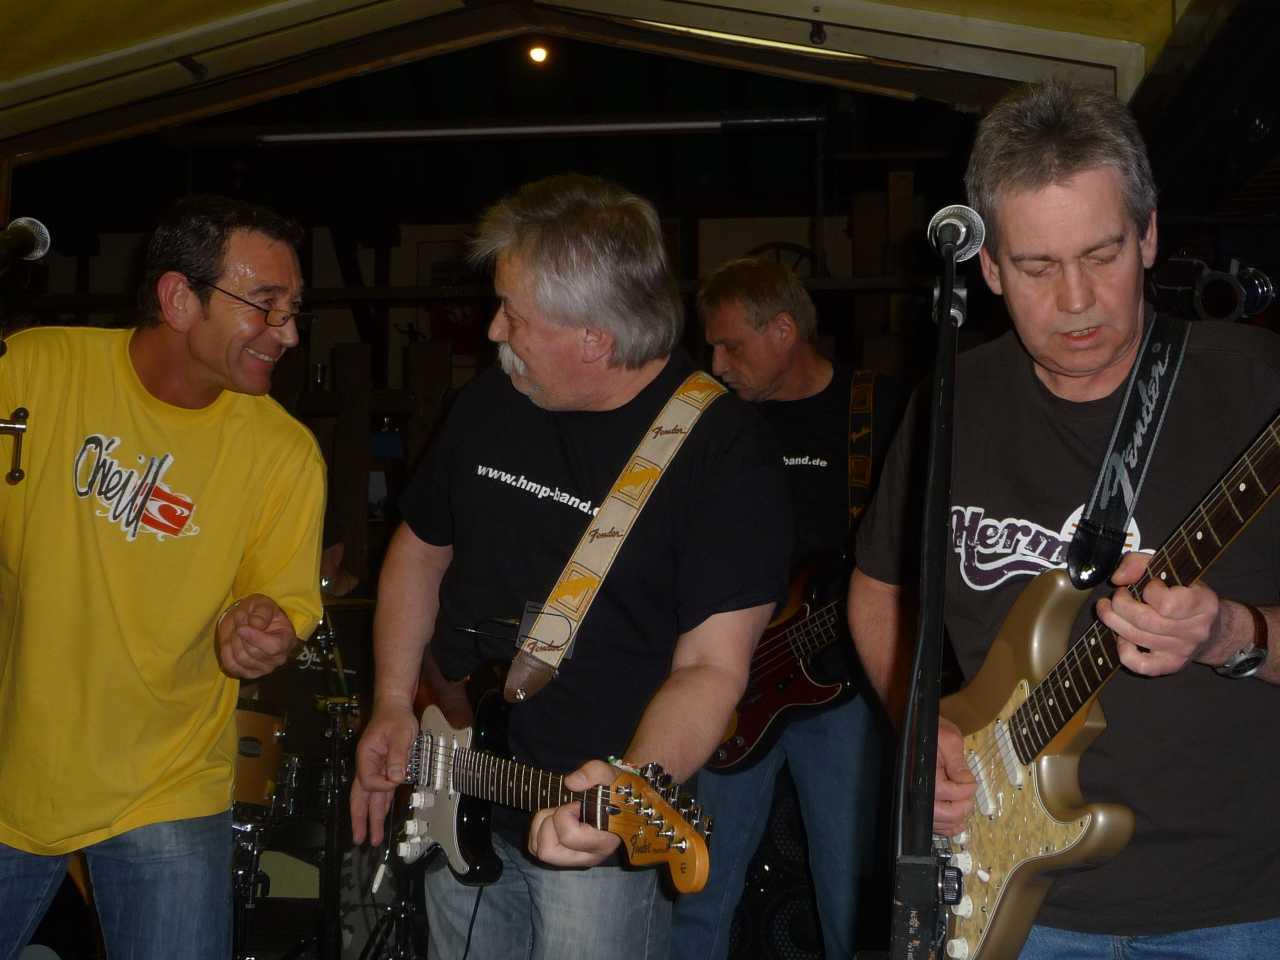 http://4.bp.blogspot.com/_9TBIkK0kfvM/S89iLq1AOzI/AAAAAAAADDI/LODYUcAk2ns/s1600/jurgen,Uwe,Bernd.jpg